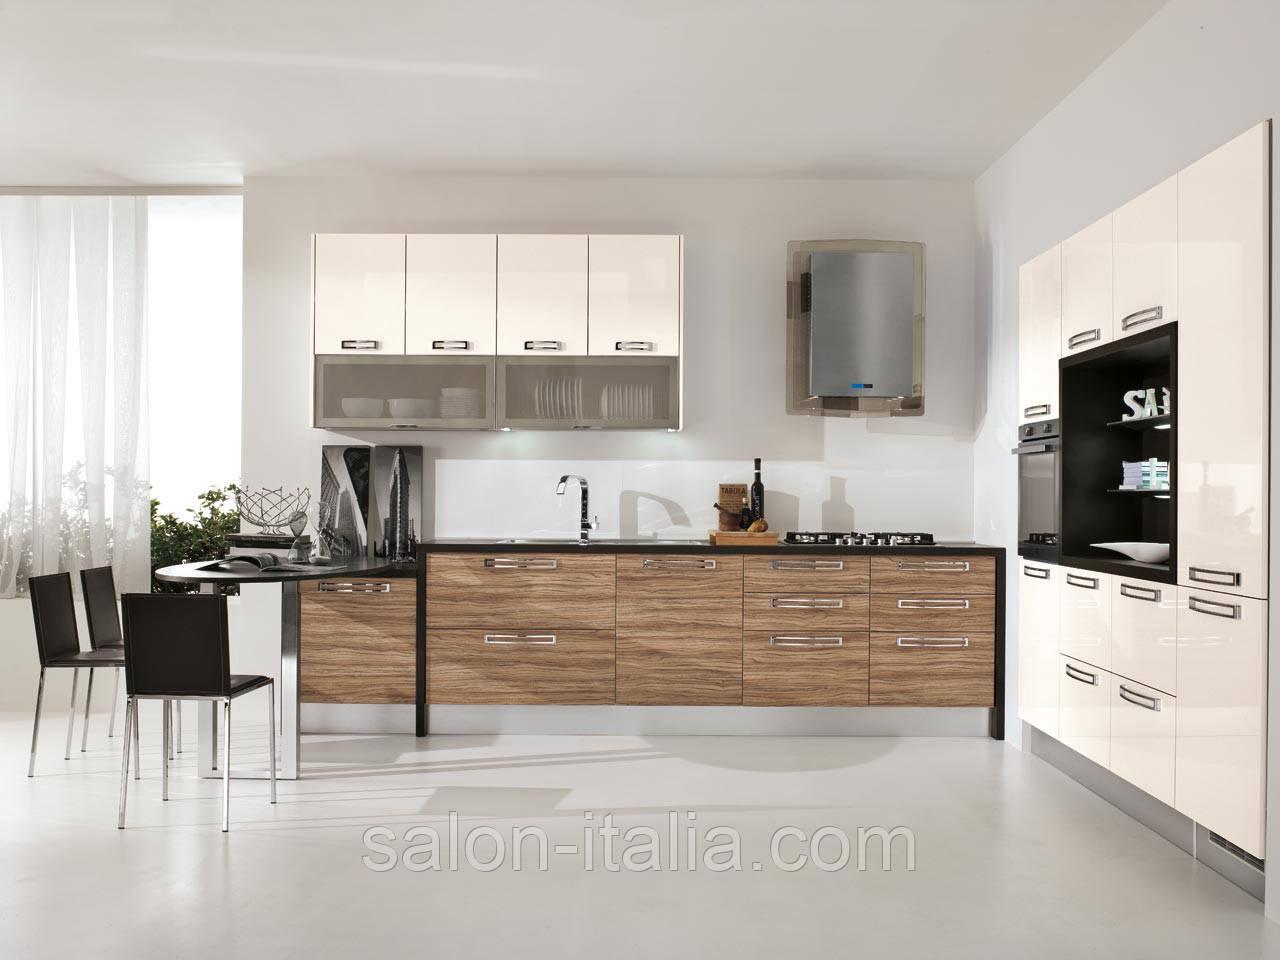 Кухня Alessia, LUBE (Італія)